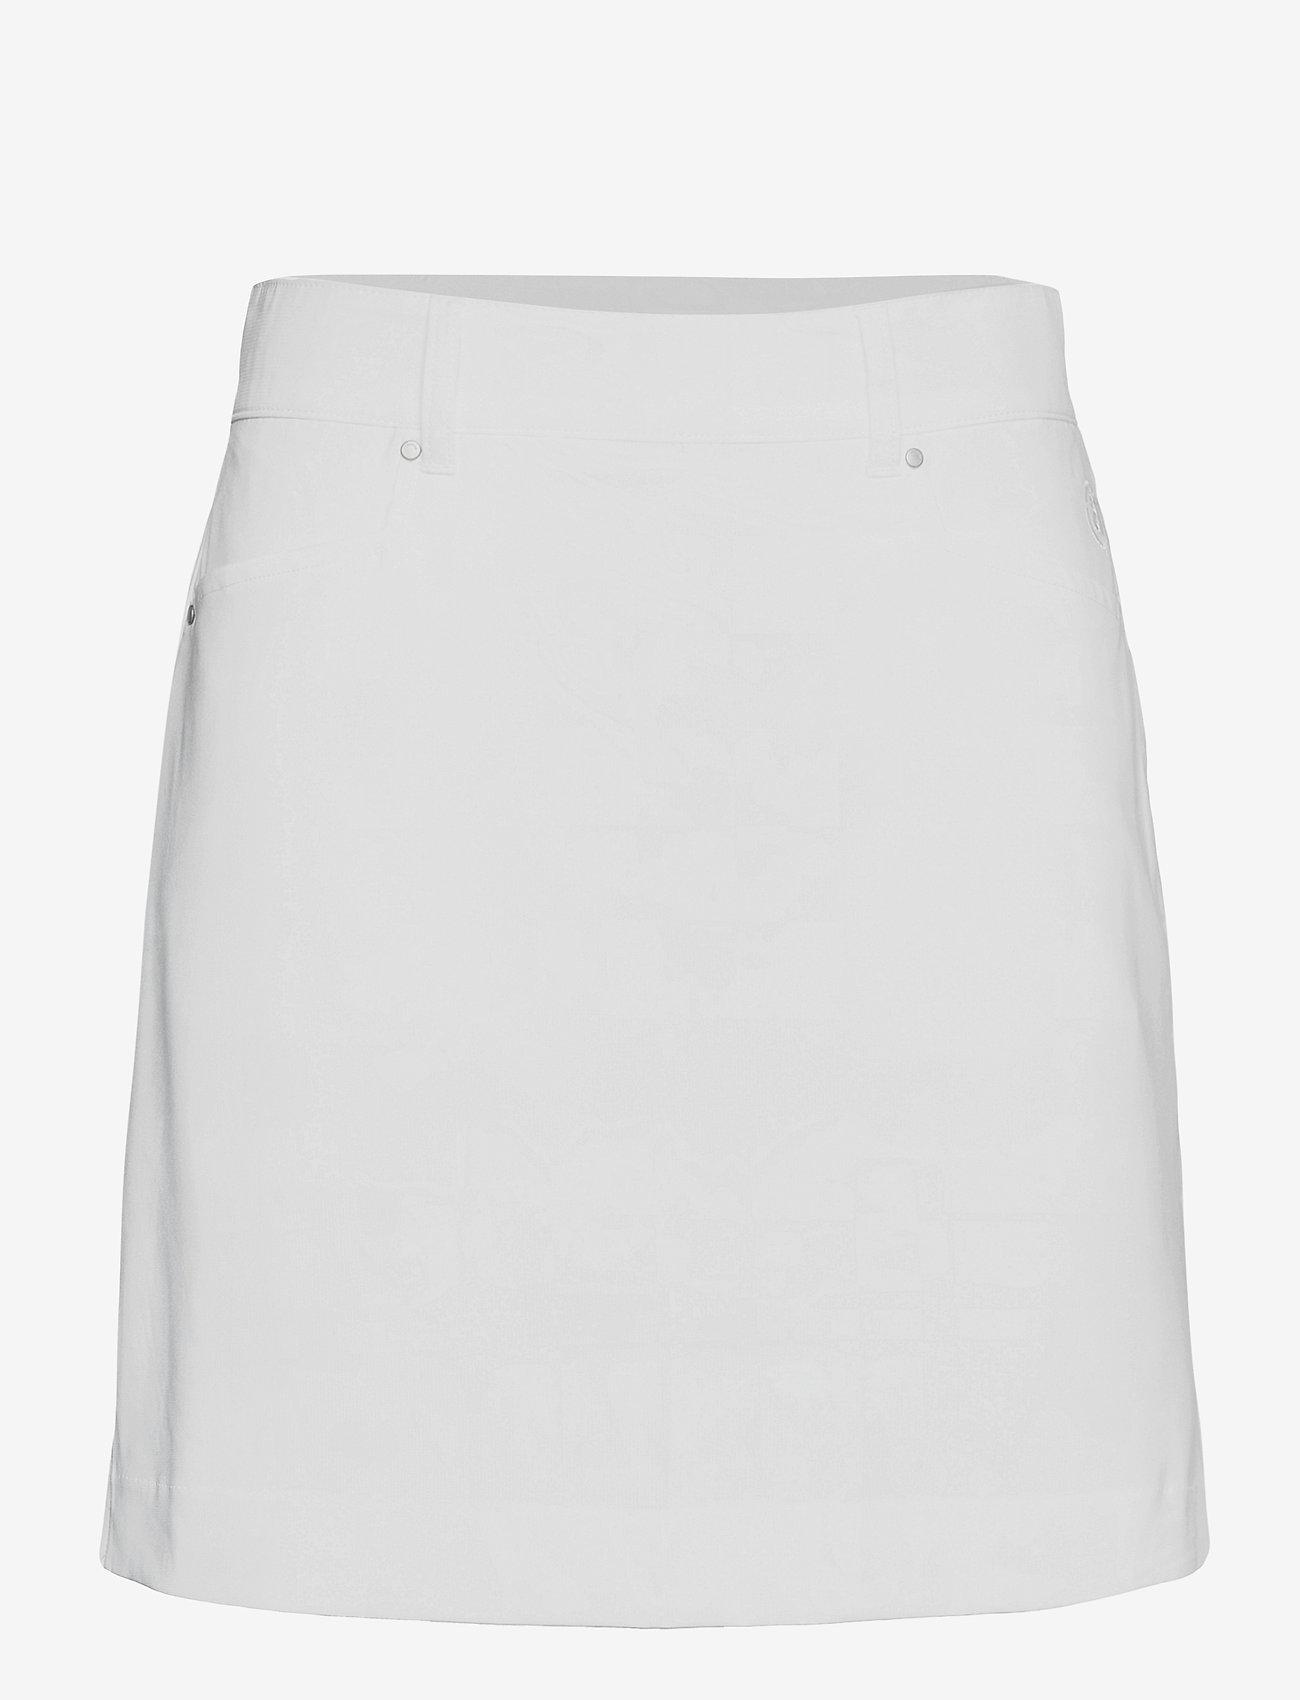 Abacus - Lds Cleek skort 50cm - rokjes - white - 0